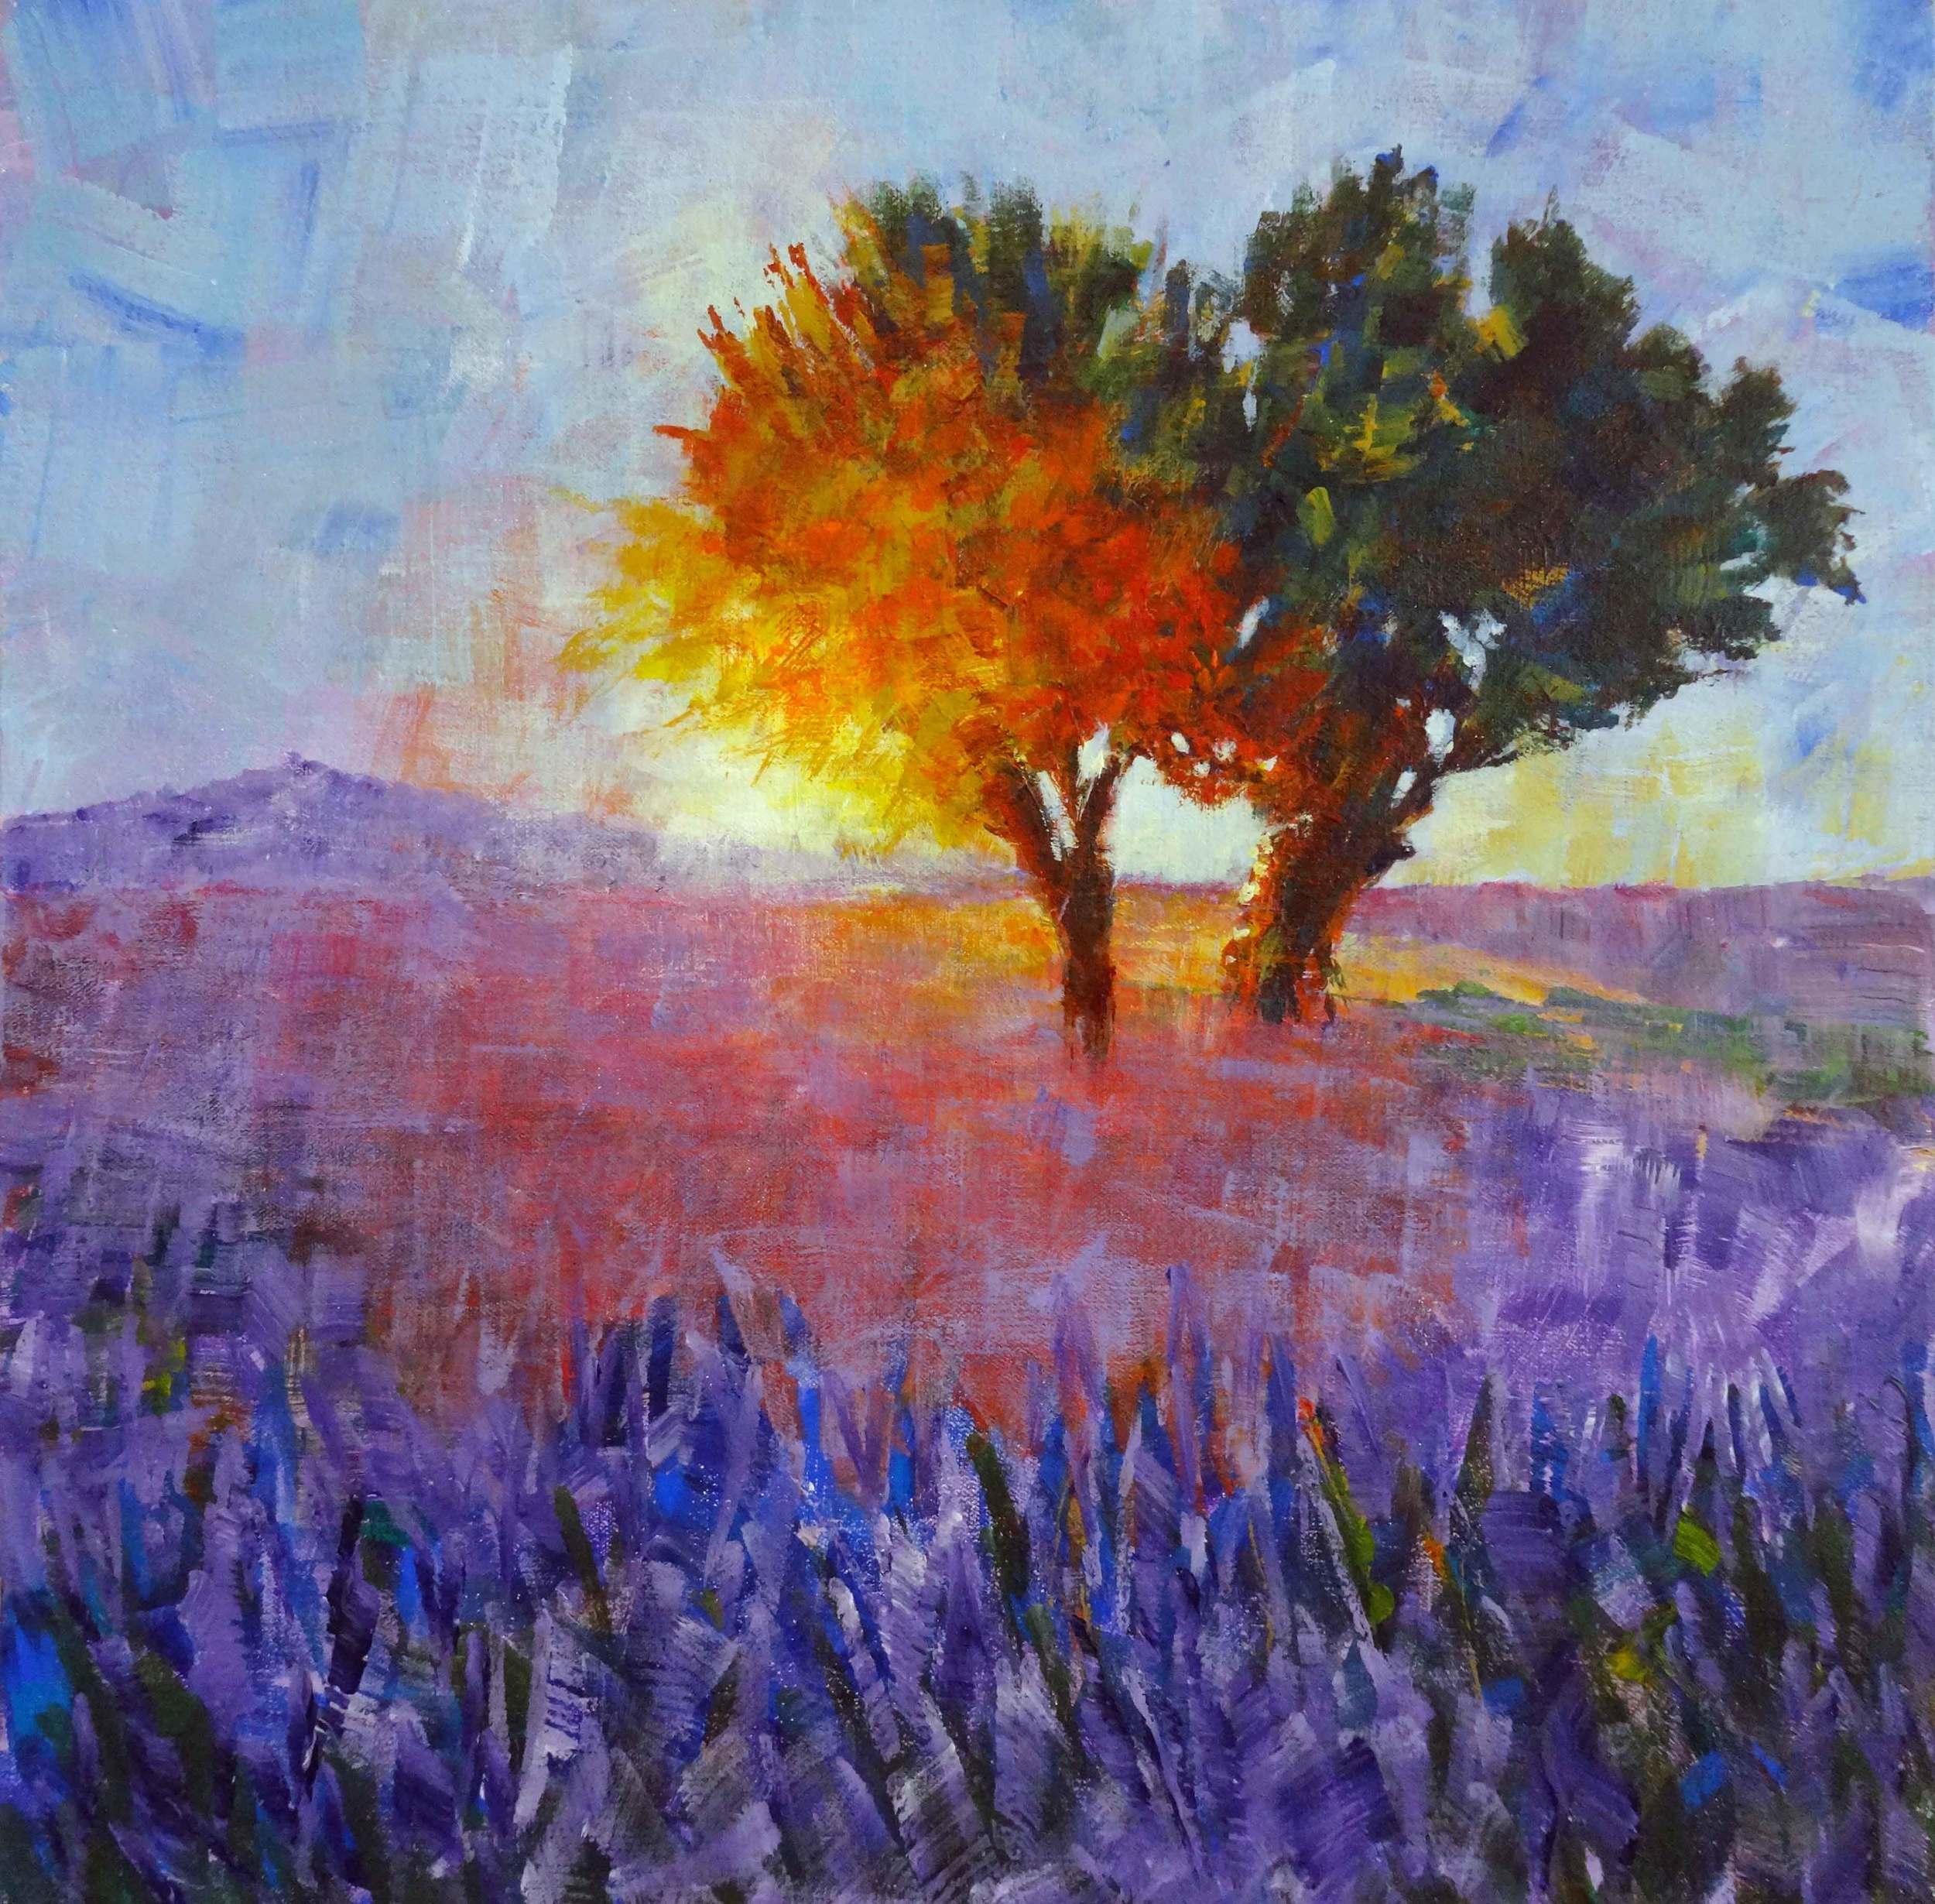 Fields of Violet